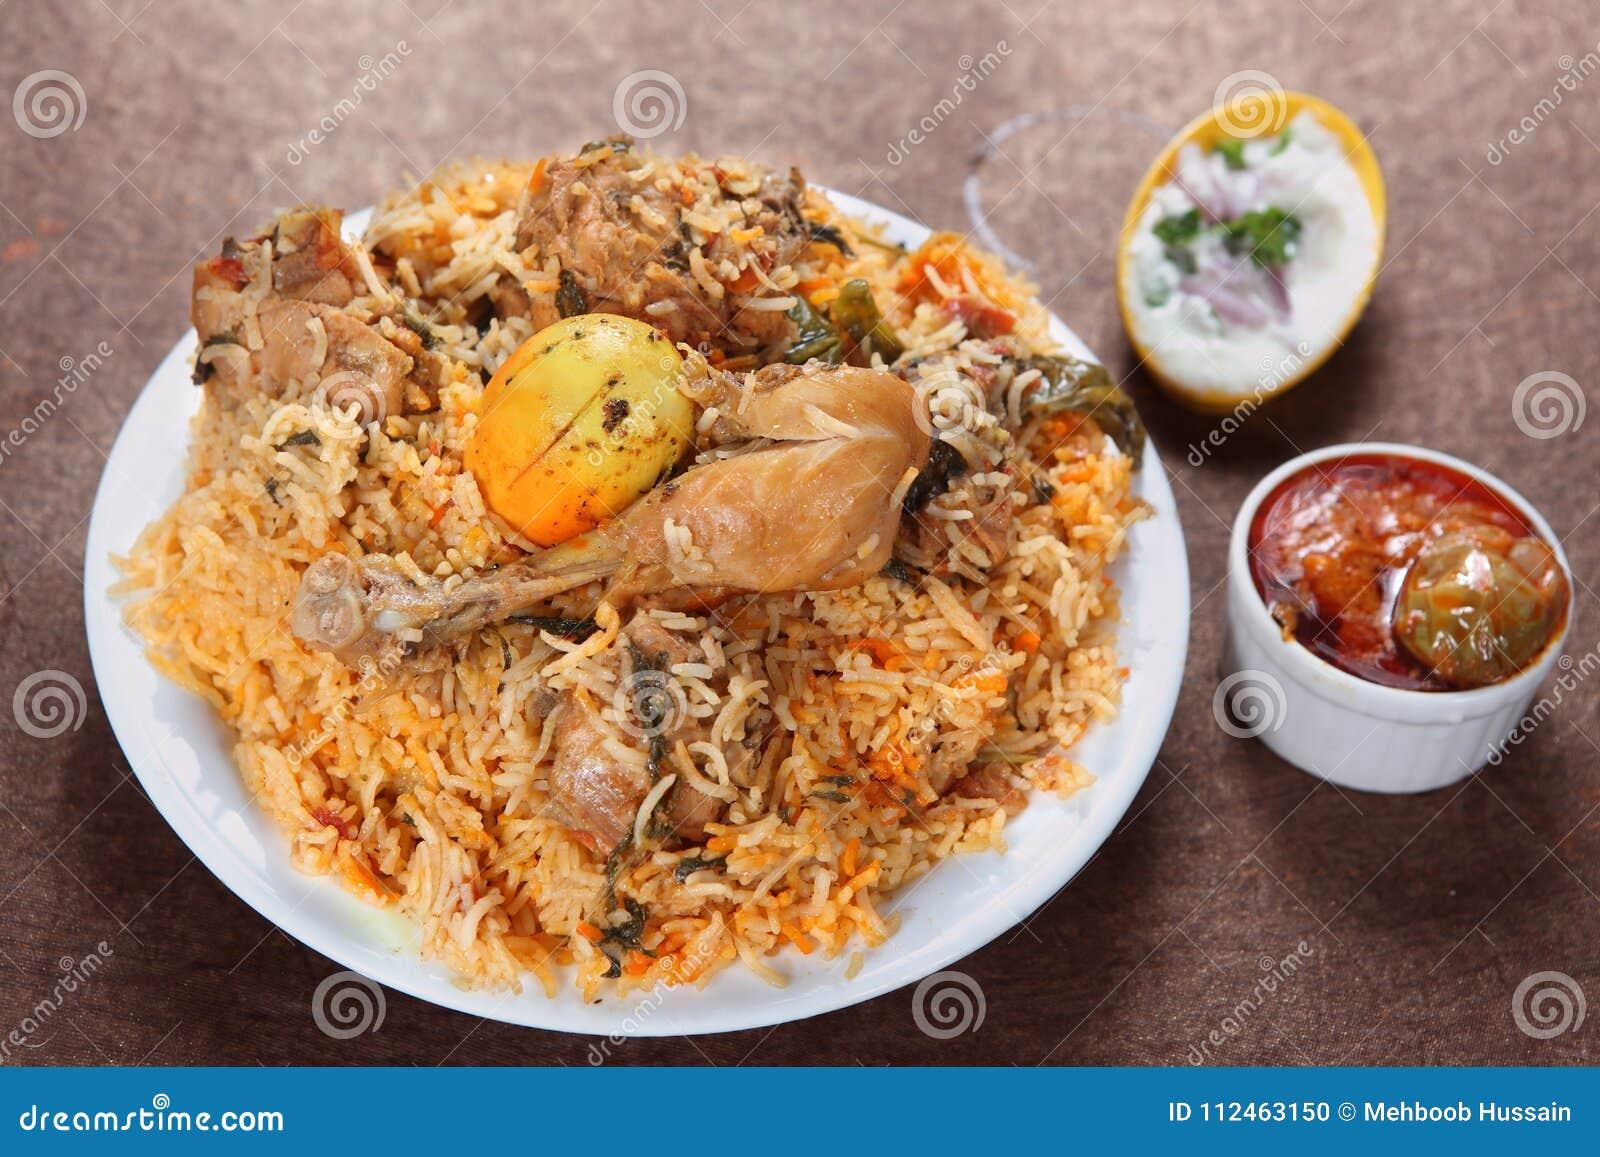 鸡biryani, Murgh Biryani